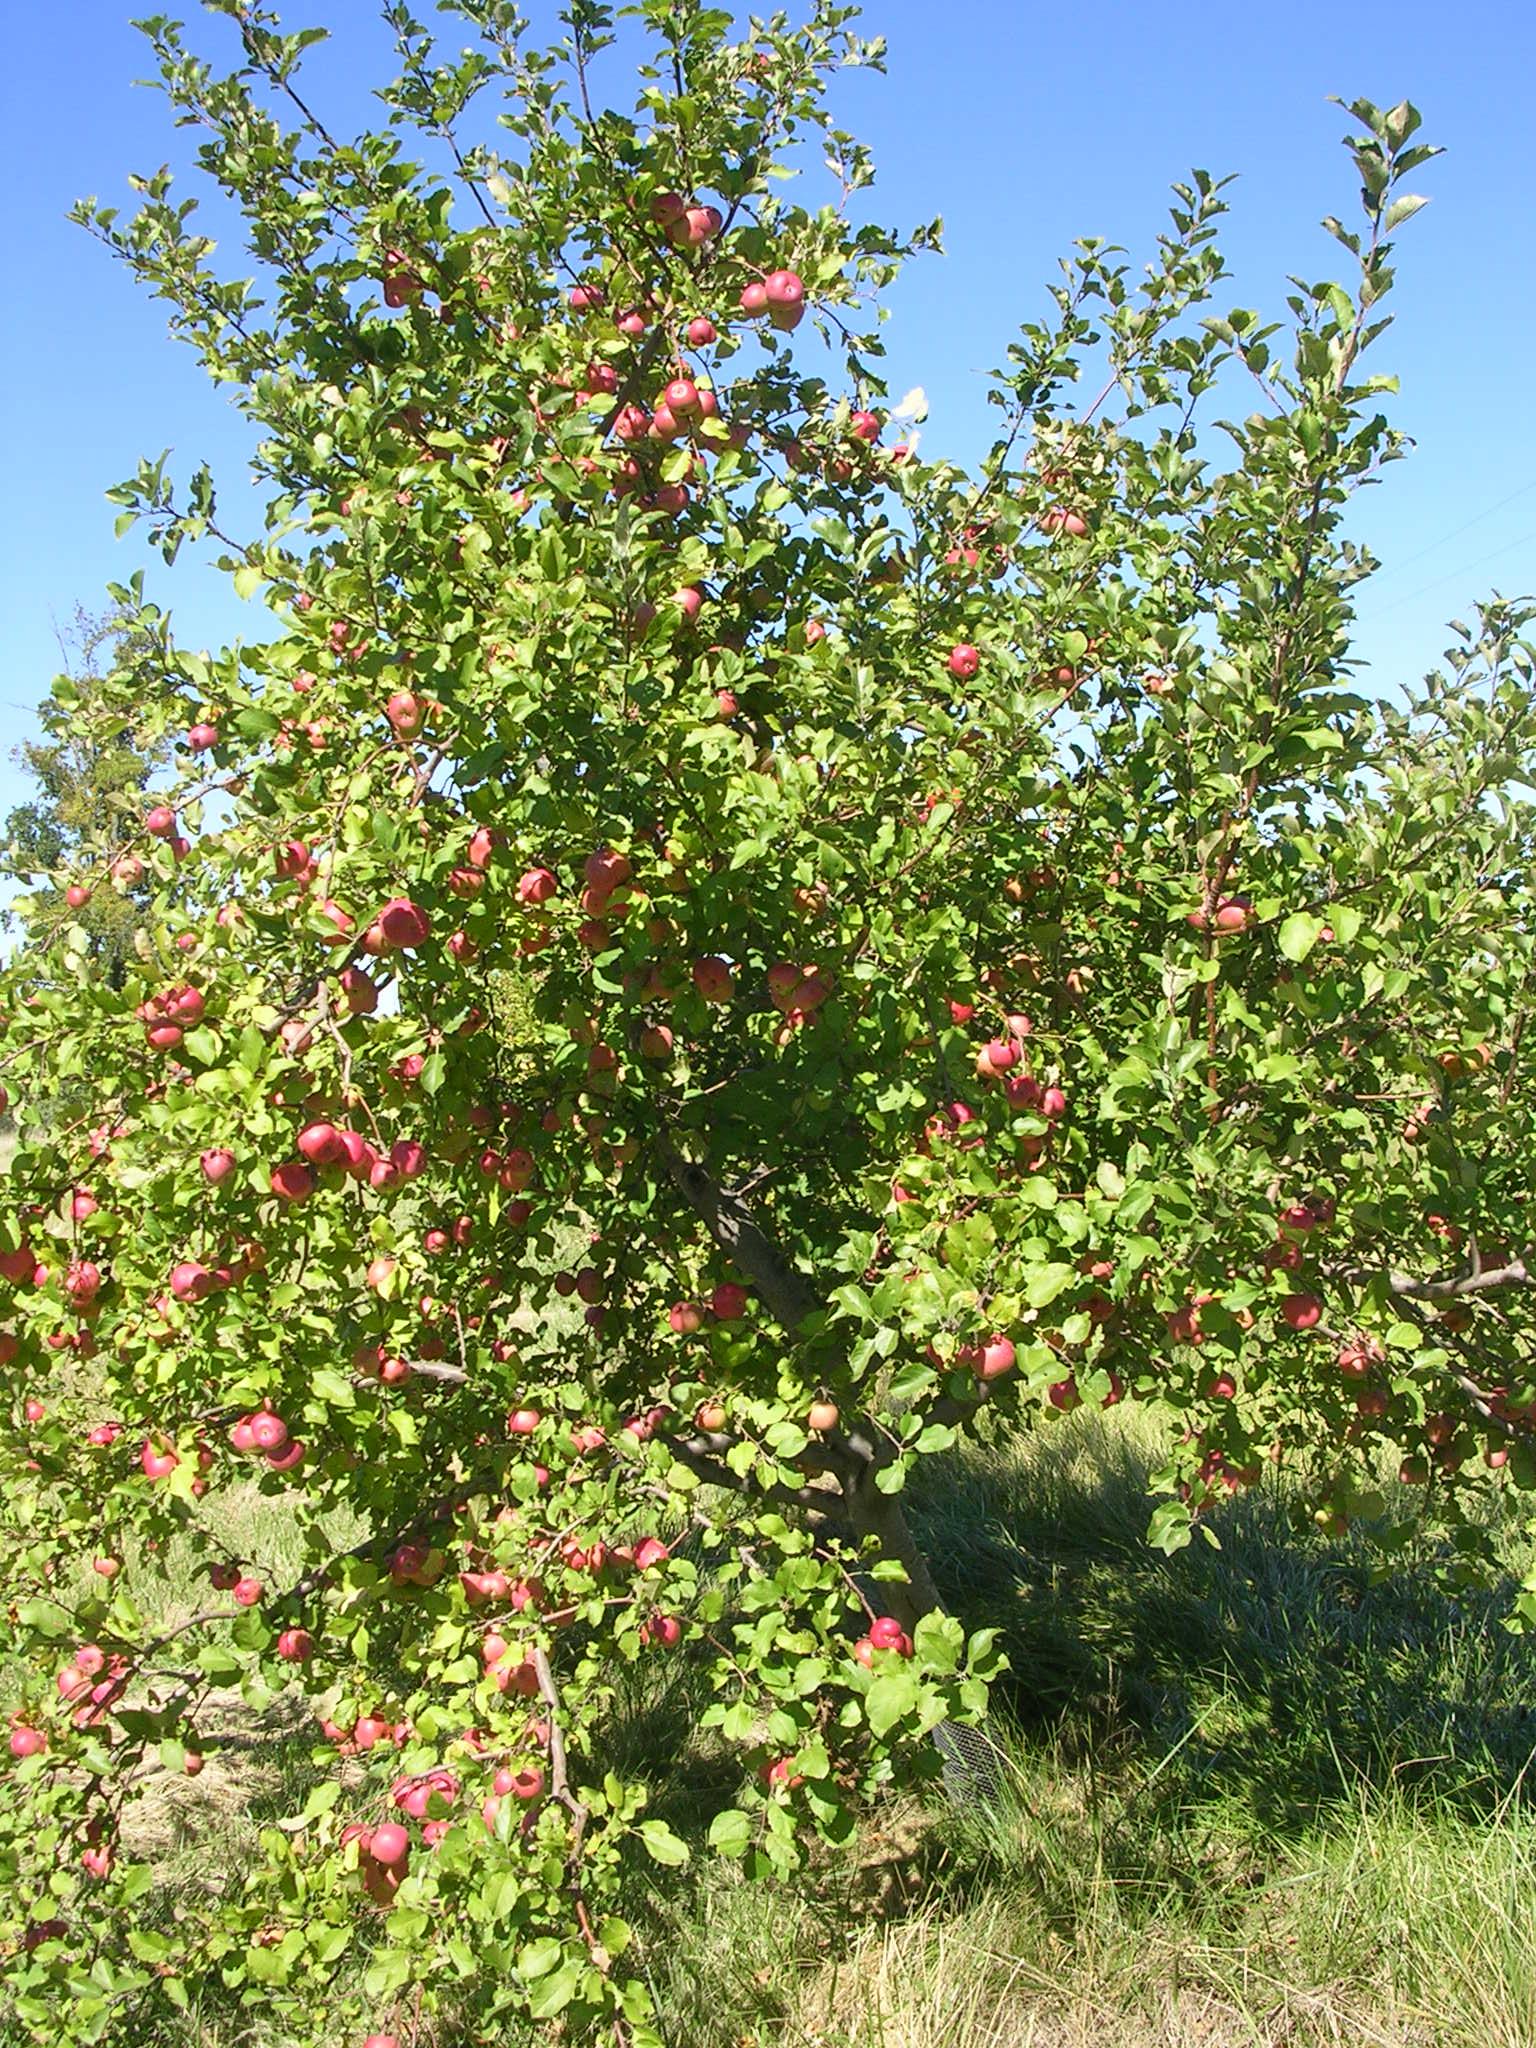 Charming Caring Apples Honeycrisp Apple Tree Pests Honeycrisp Apple Tree Spacing Apple Tree Apples On It How To Grow Apples houzz-03 Honeycrisp Apple Tree